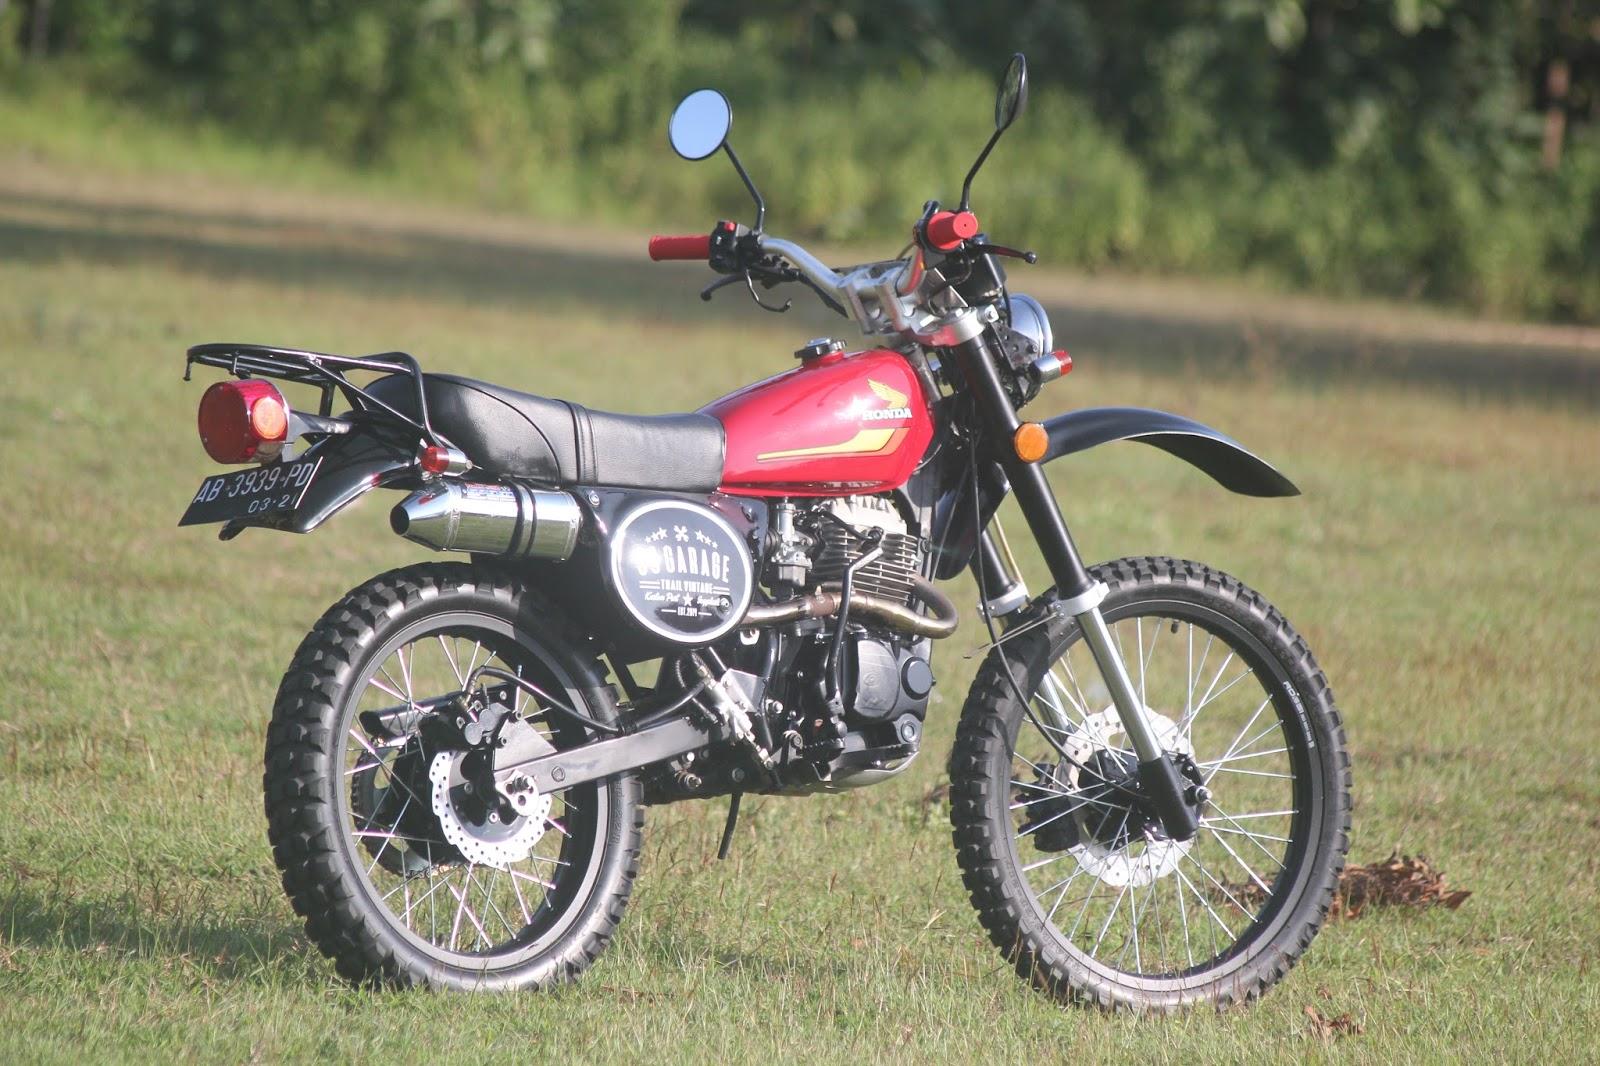 Kumpulan 100 Modifikasi Motor Trail Tua Terunik Rante Modifikasi